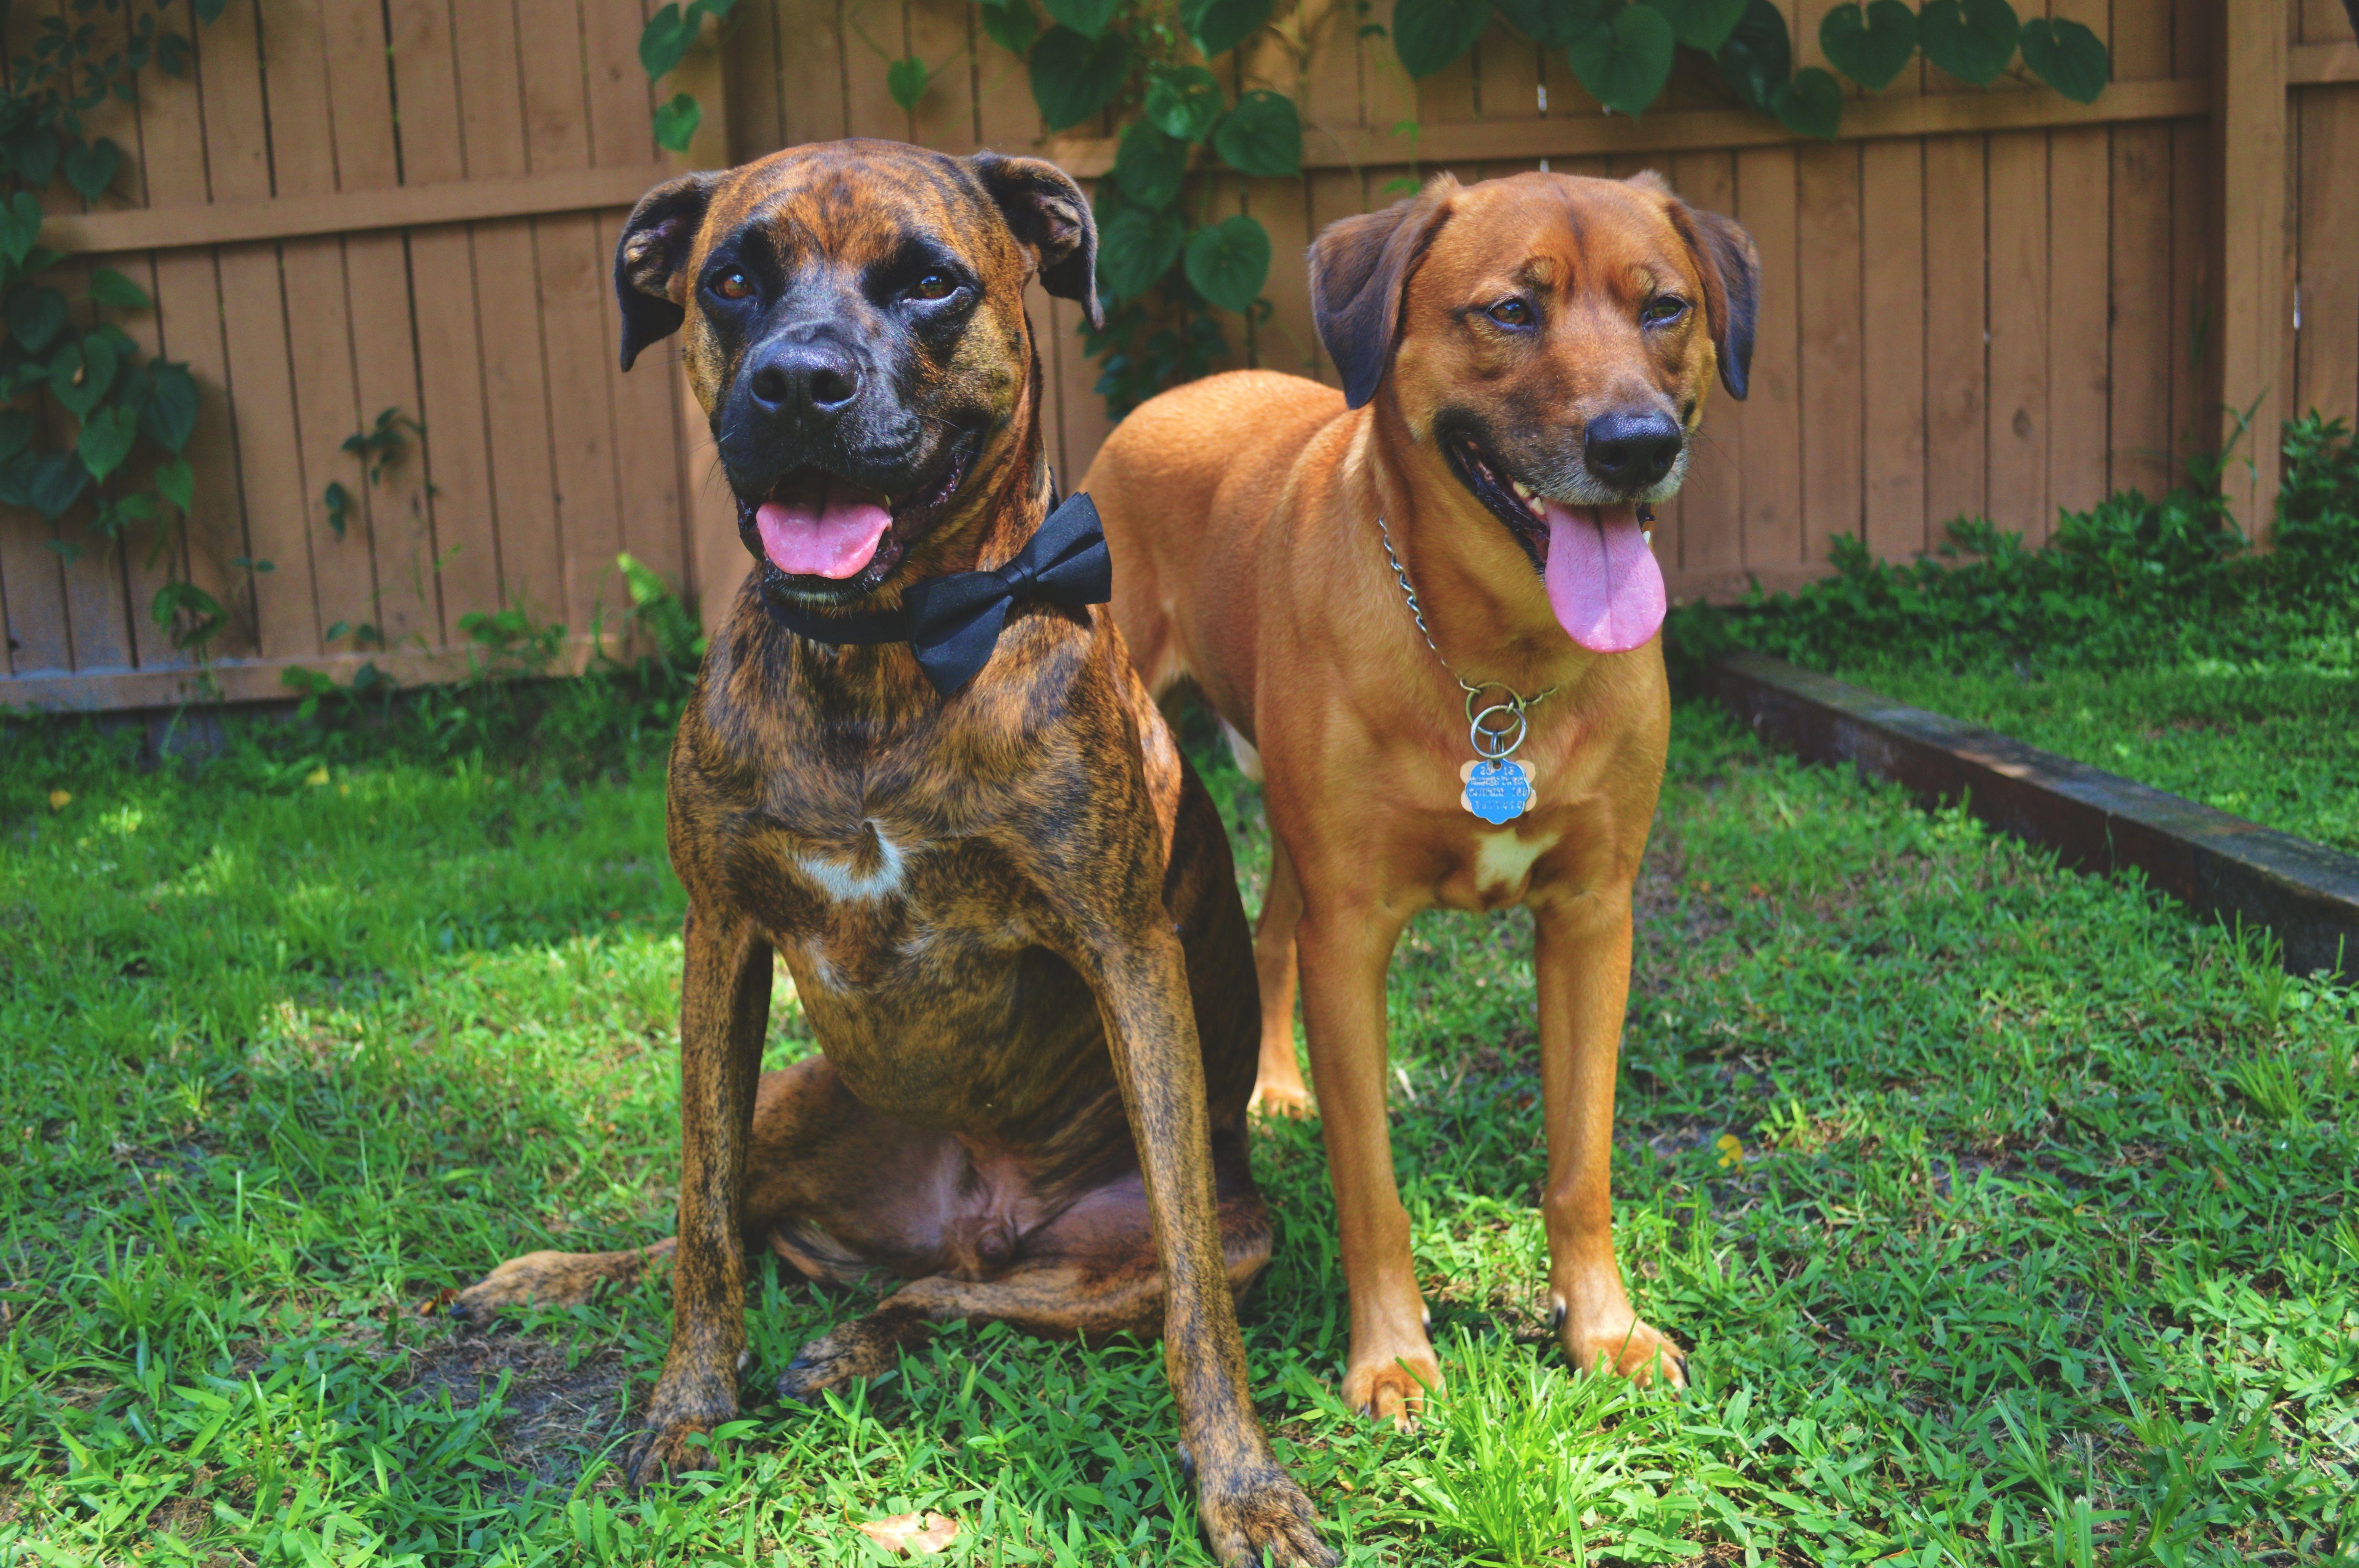 Popular Brindle Boxer Bow Adorable Dog - 7d3924c75c5393ec7f729f1a2e812b6f  Gallery_949752  .jpg